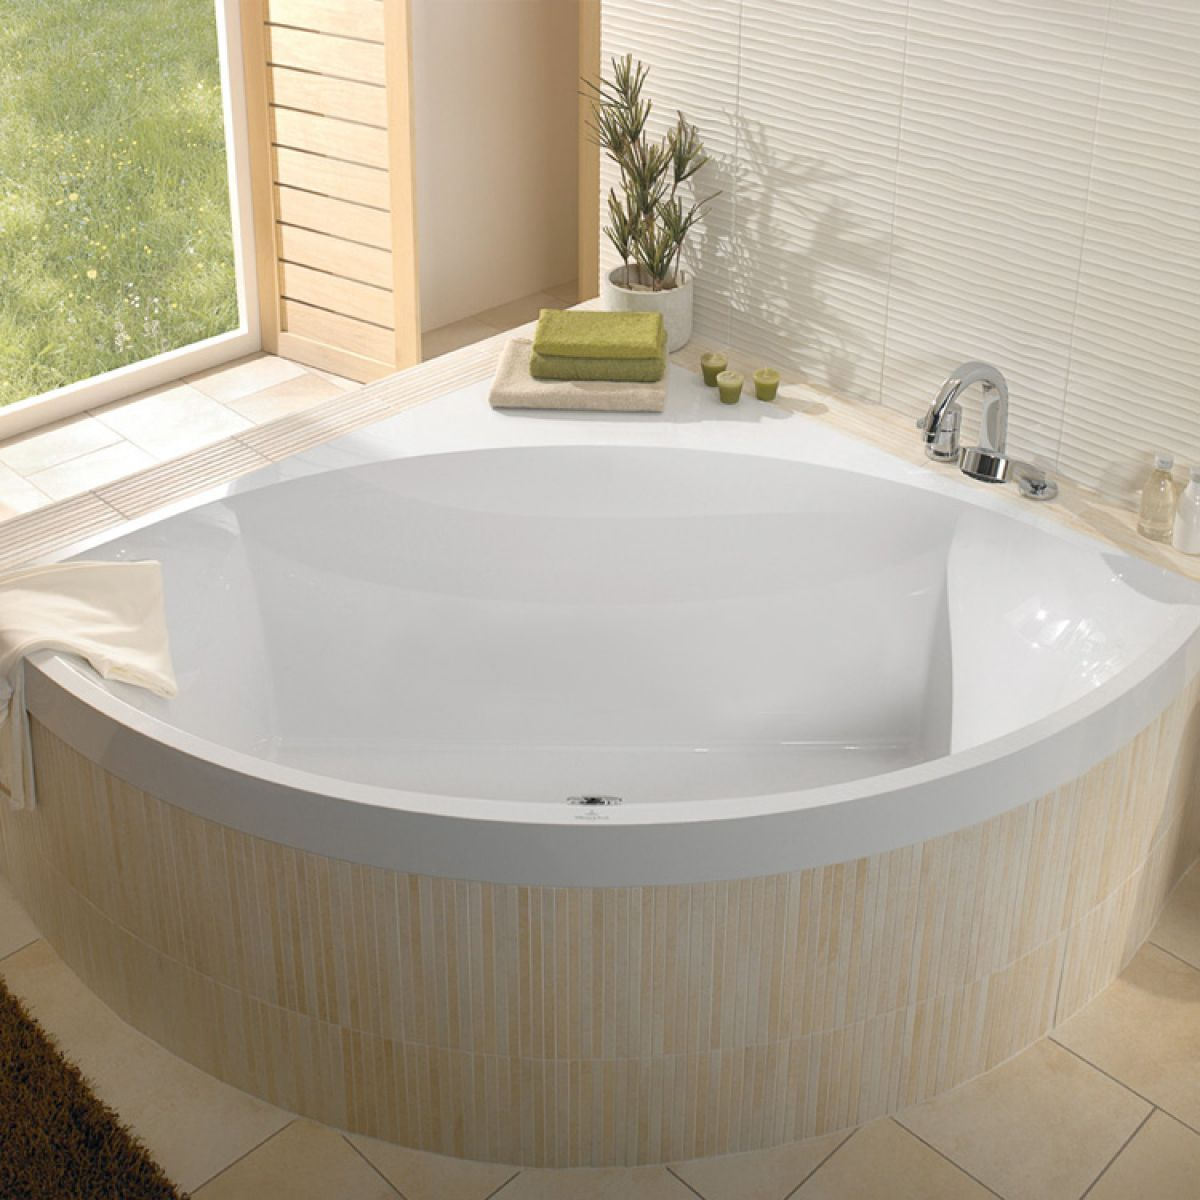 Https Www Ukbathrooms Com Images 1200 1200 78628 Jpg Bathroom Design Corner Bathtub Minimalist Bathroom Design